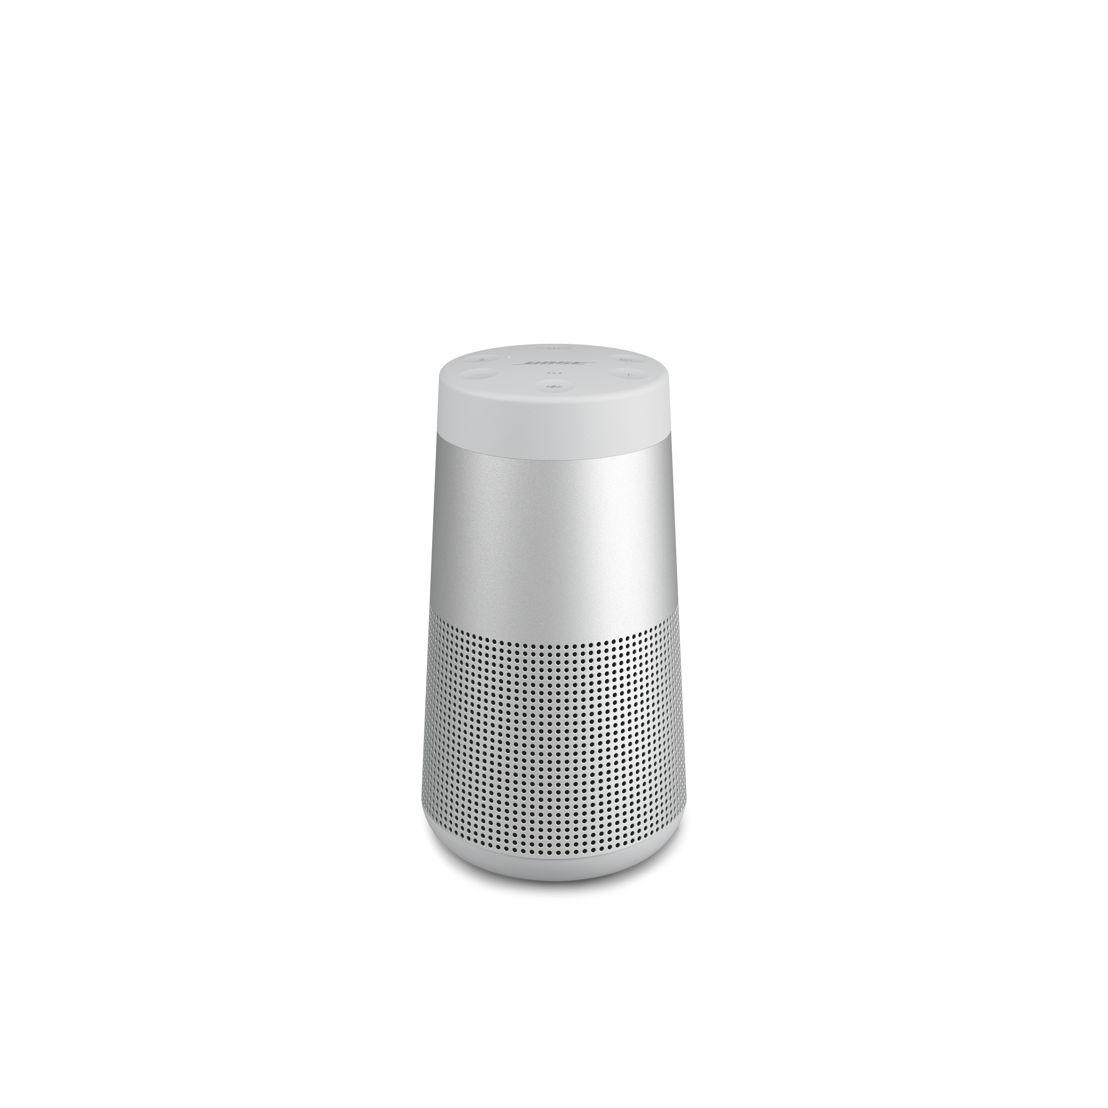 Bose_SoundLink Revolve_ € 229,95